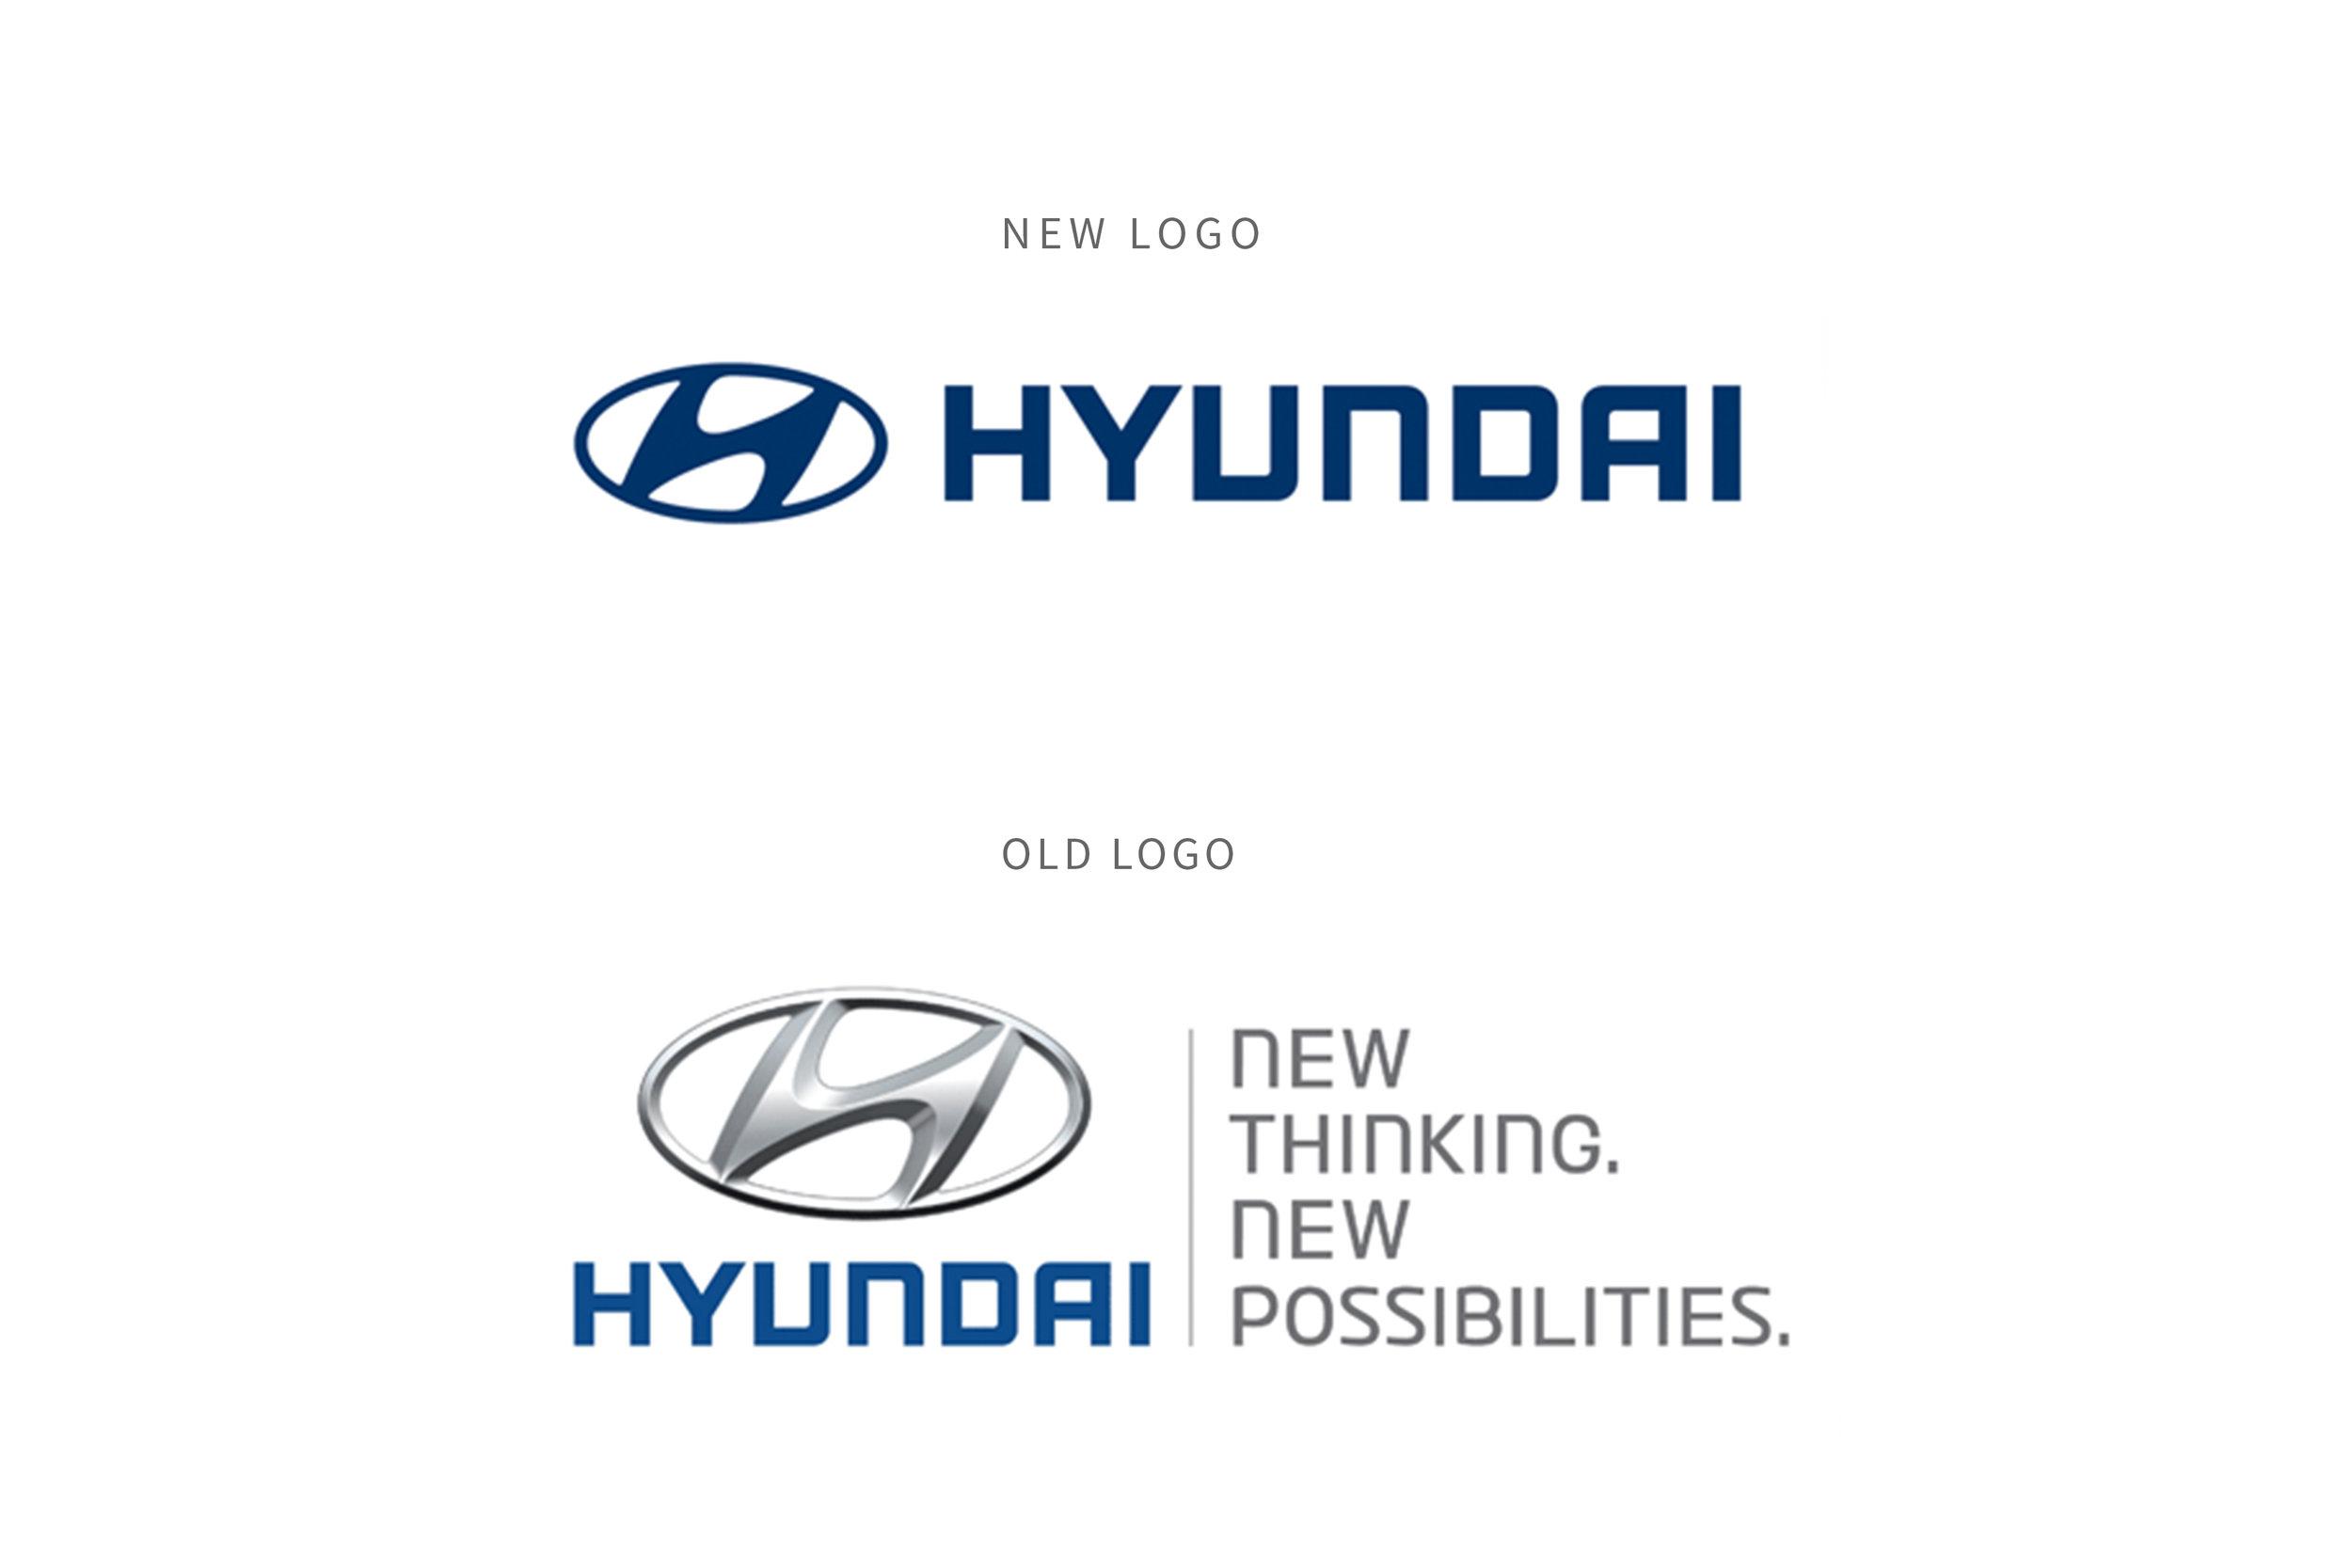 Hyundai_Logo_Redsign_Studio-L.jpg